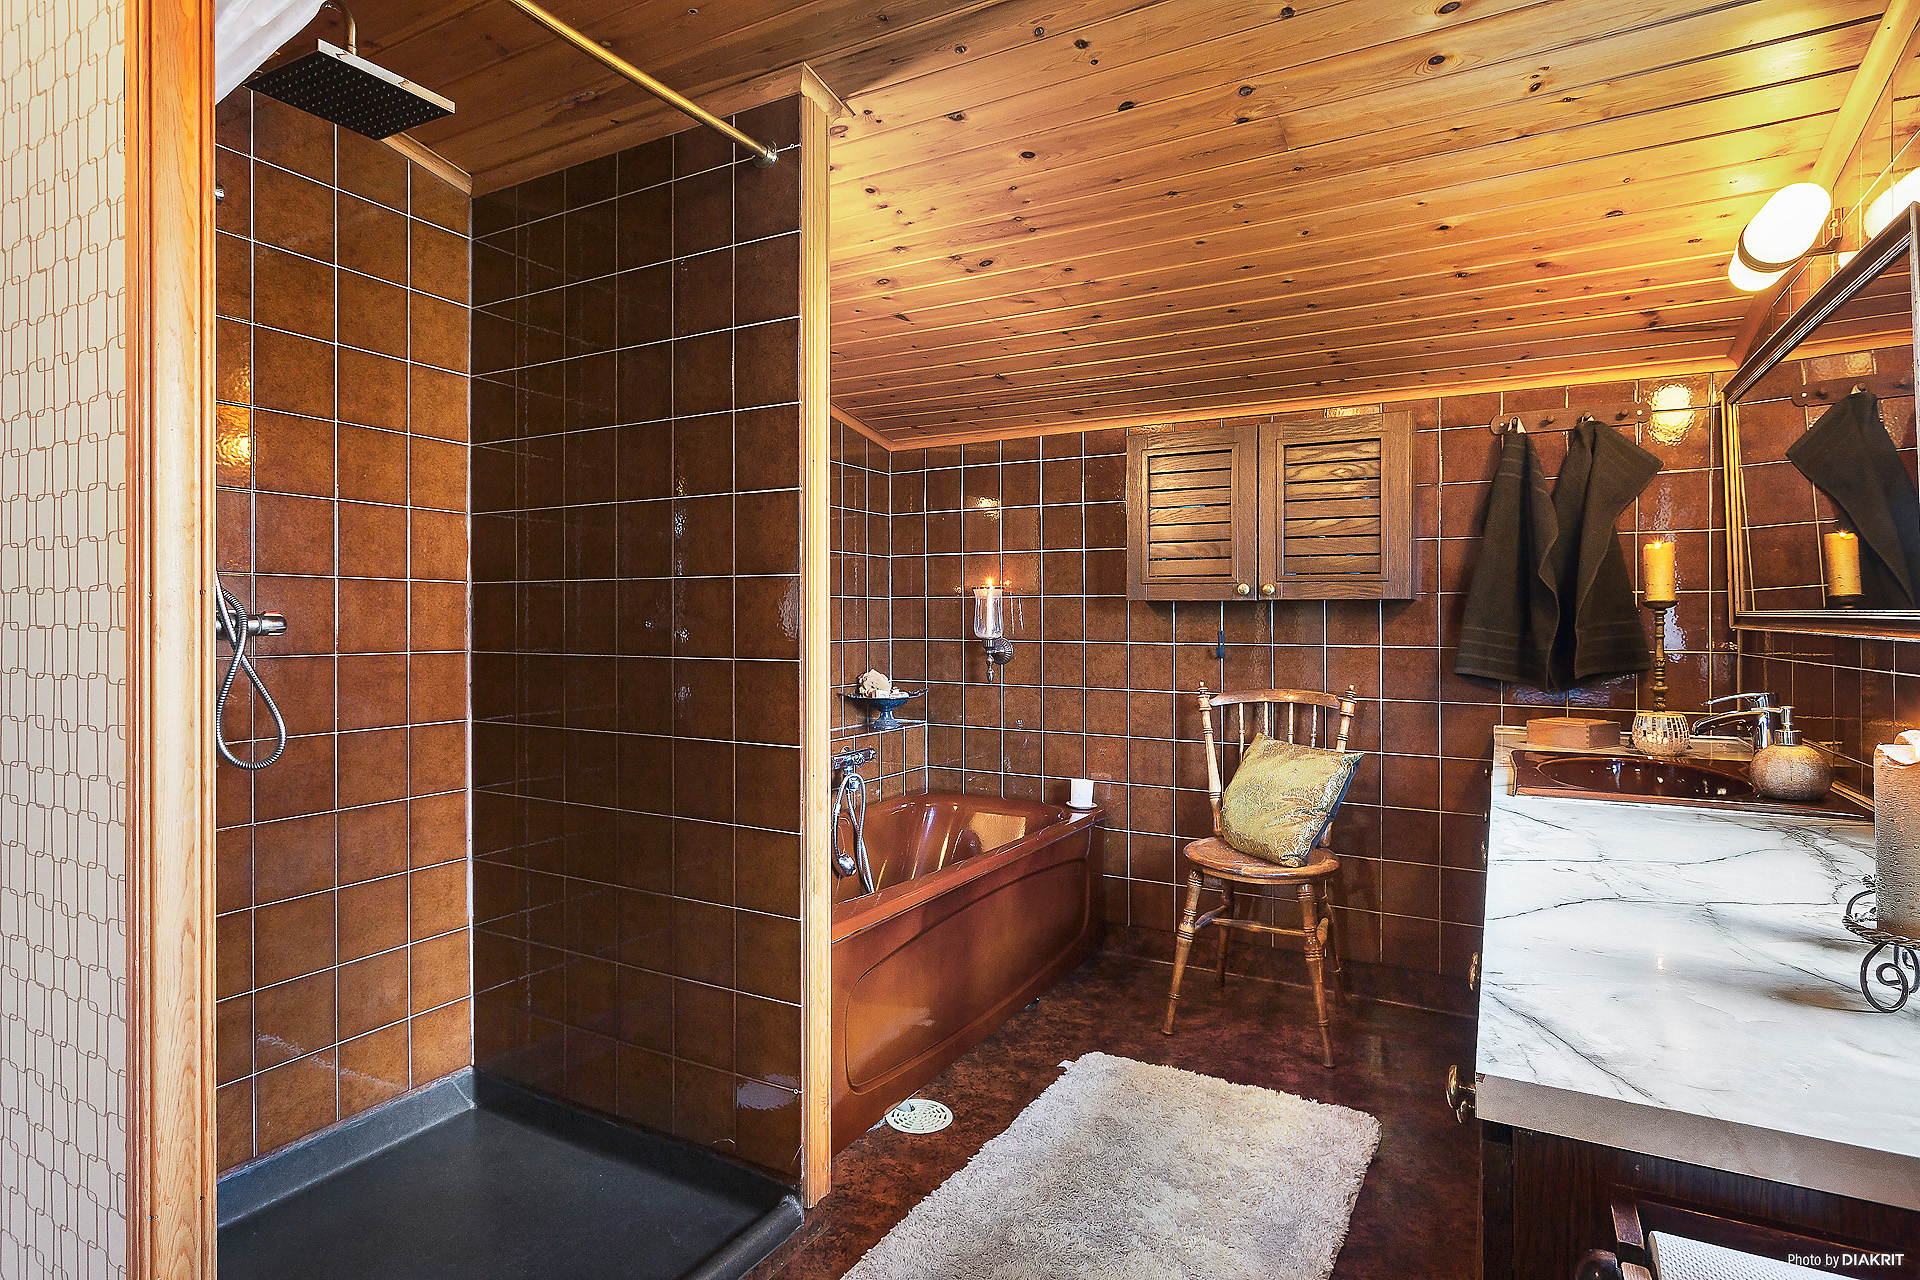 Dusch/badrum med ny golvmatta + brunn i duschutrymmet.